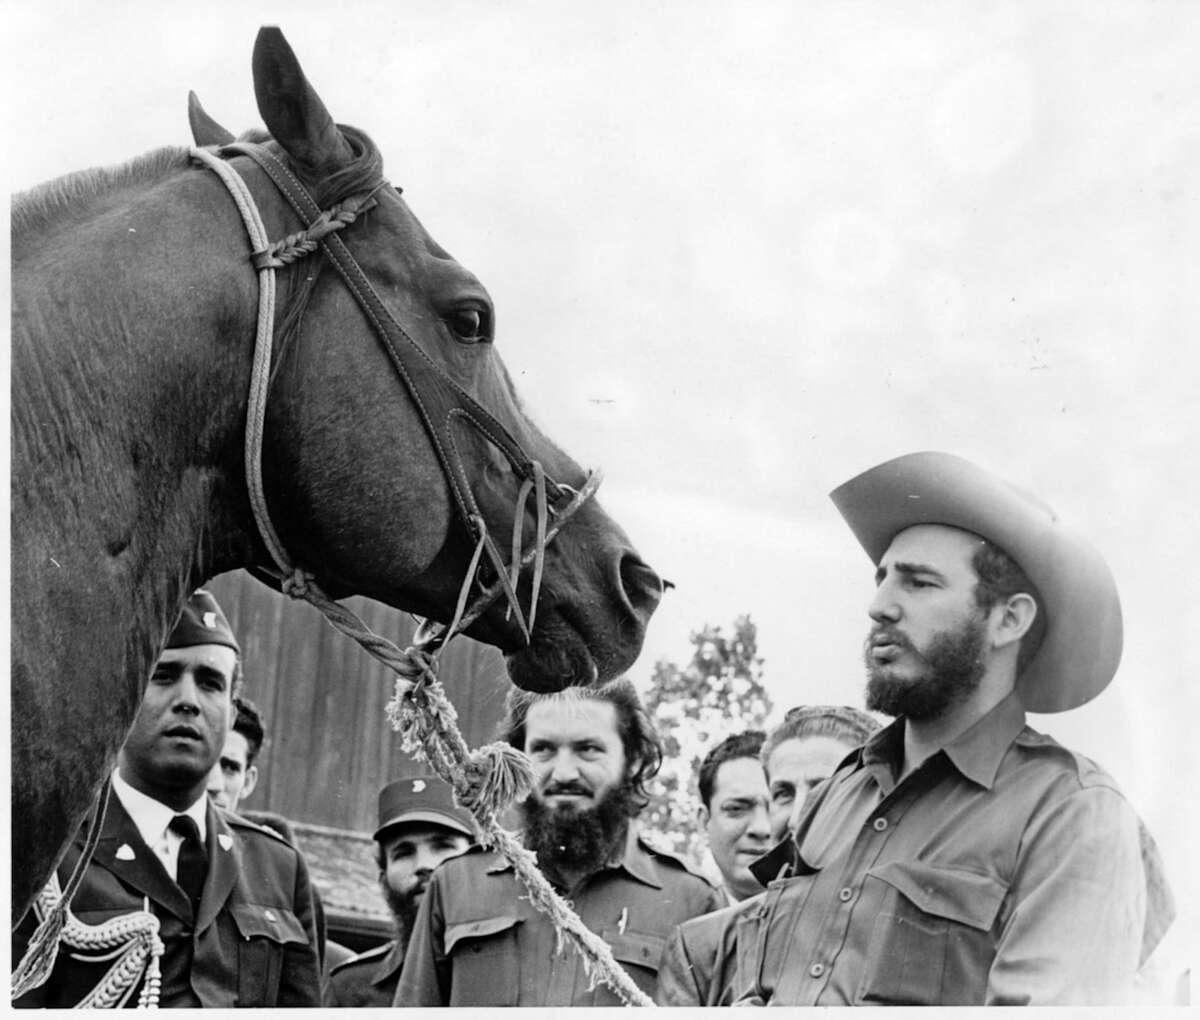 Fidel Castro at John R. Ferguson's Bar JF Ranch near Wharton on April 28, 1959. The horse's name is King Champ.